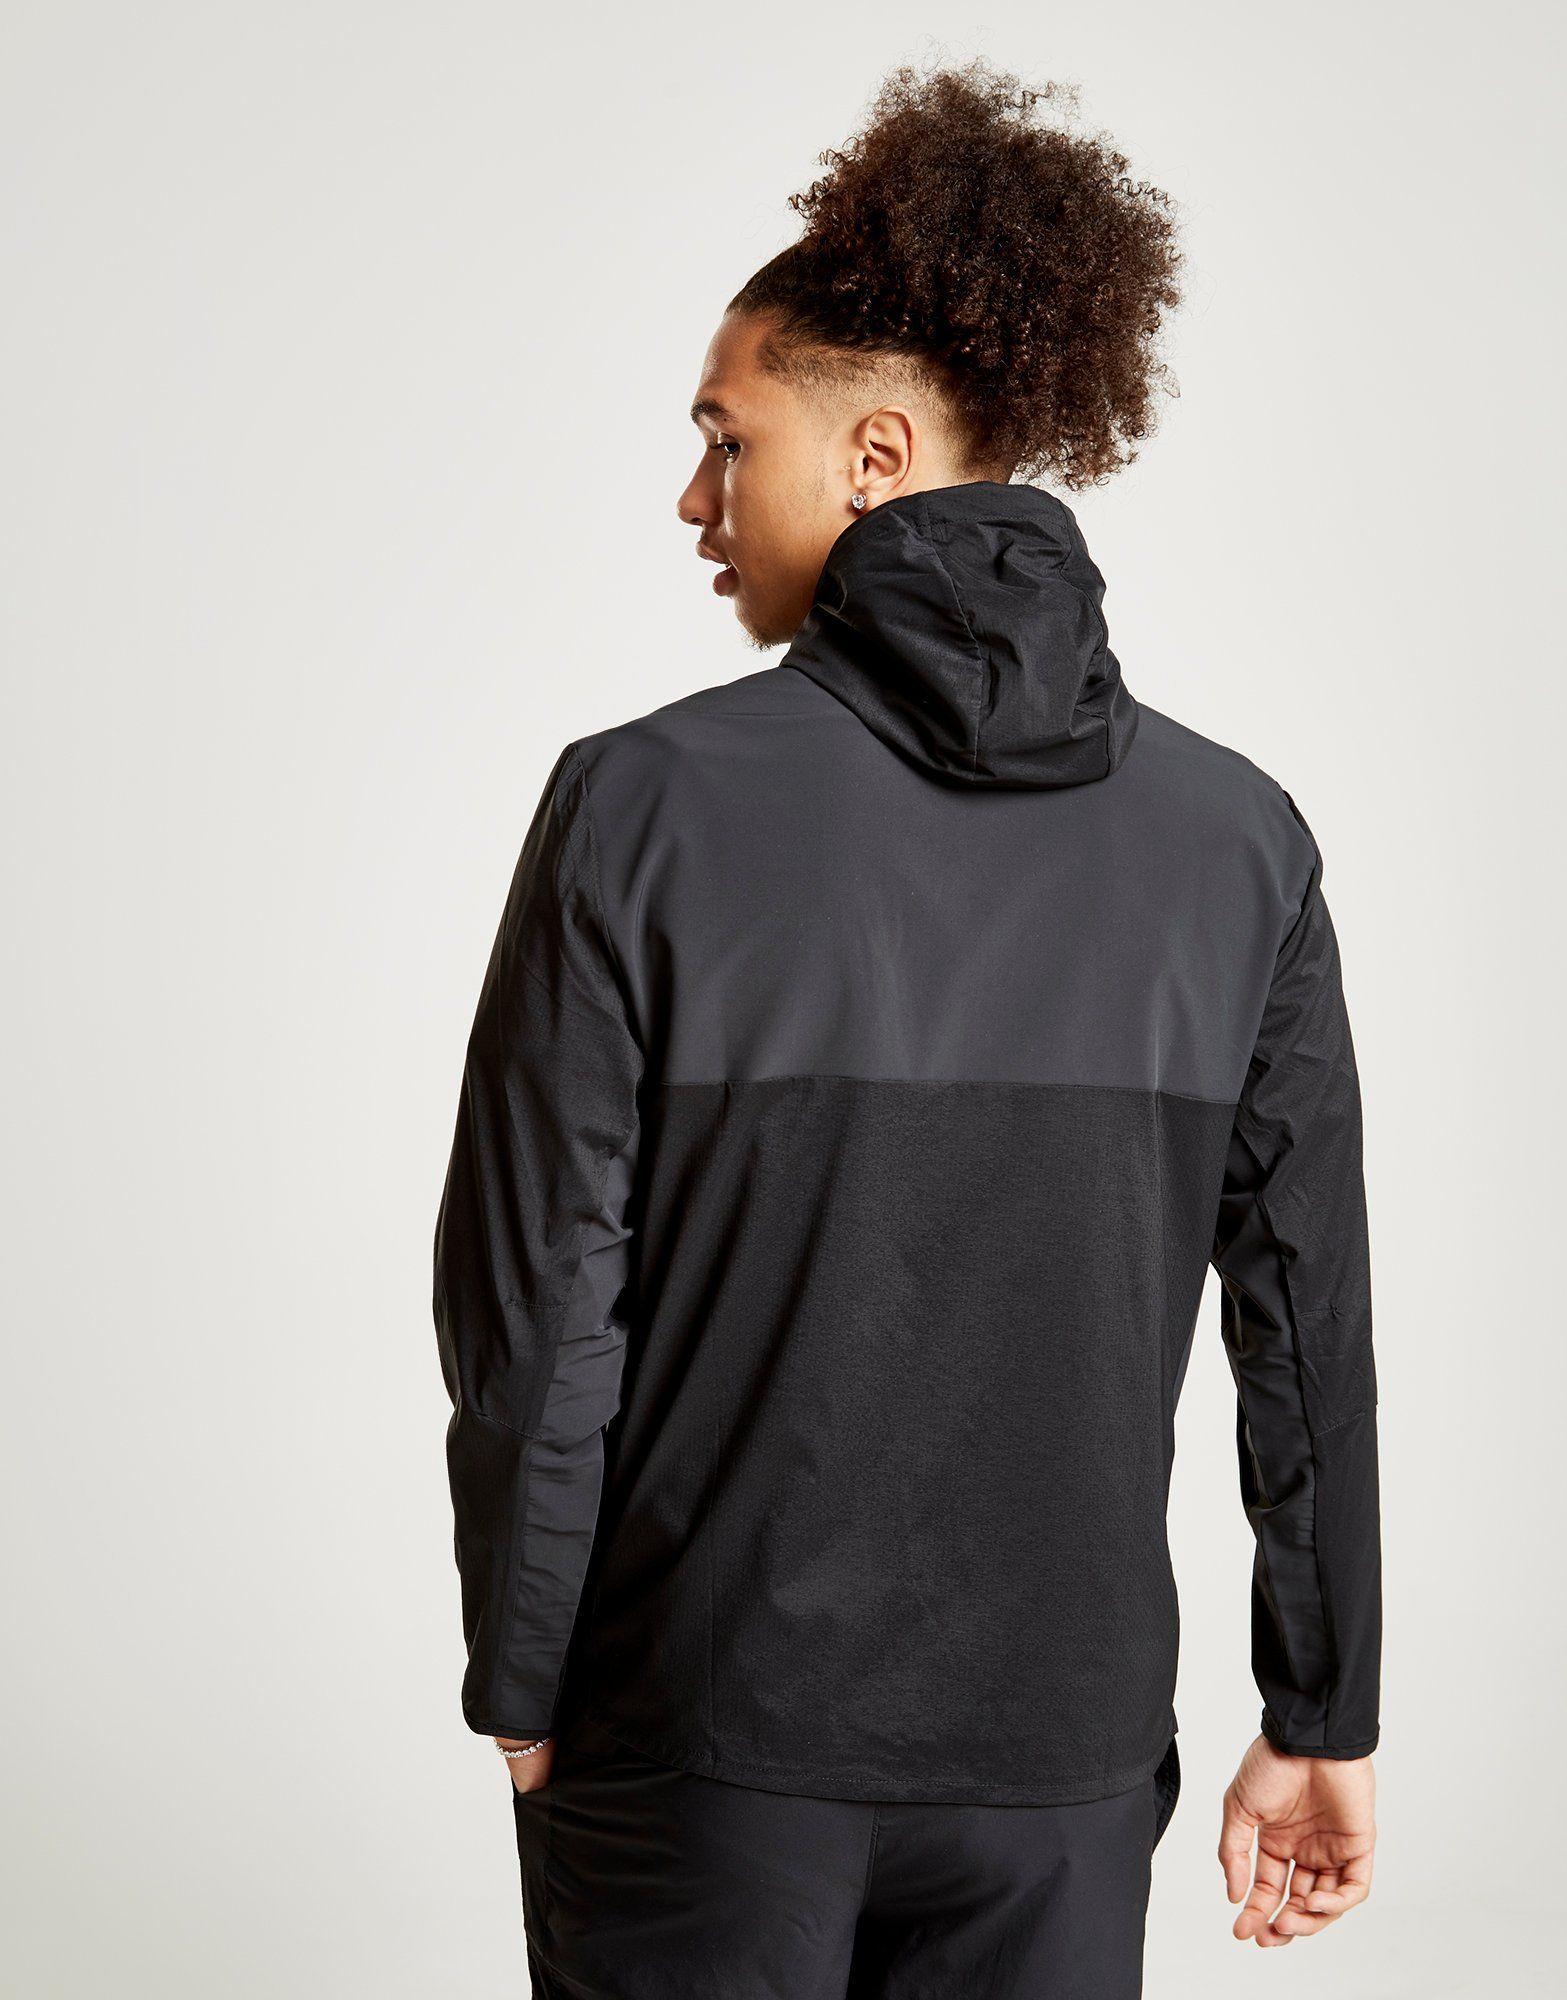 New Balance Max Intensity Jacket